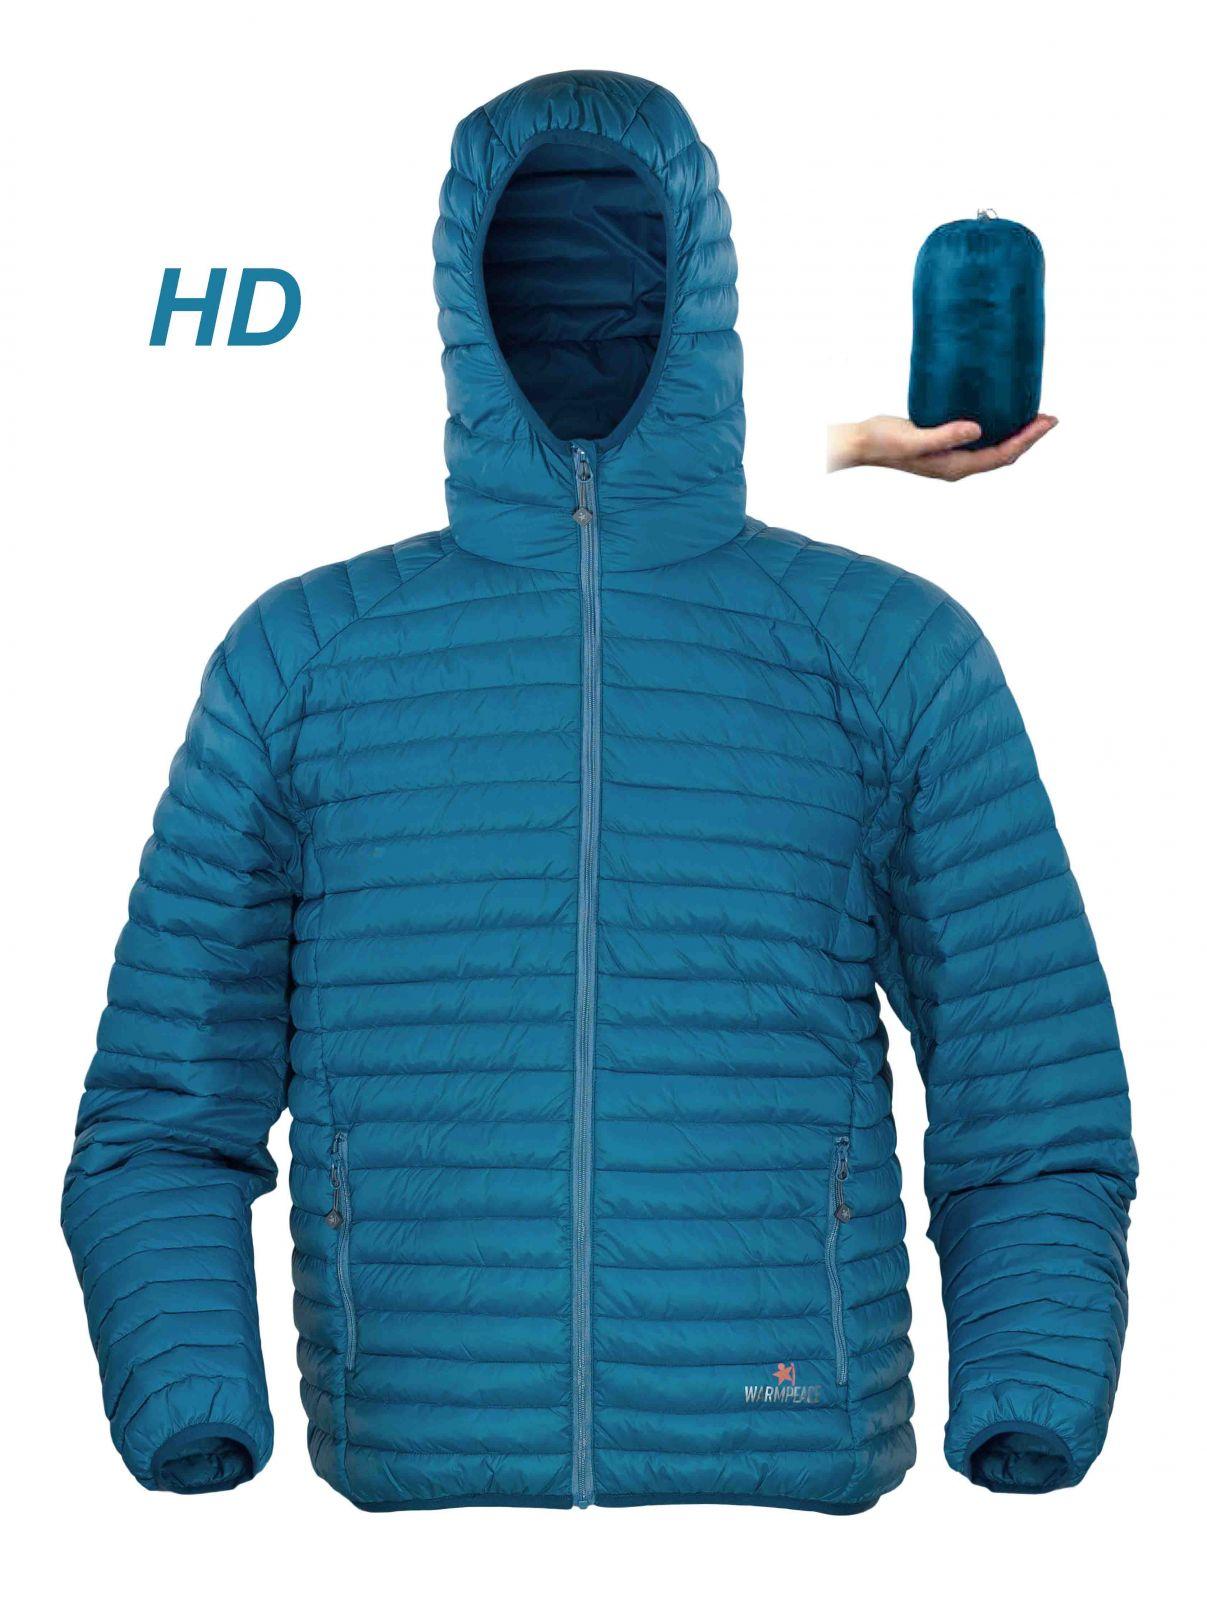 Outdoorix - Warmpeace Nordvik HD blue